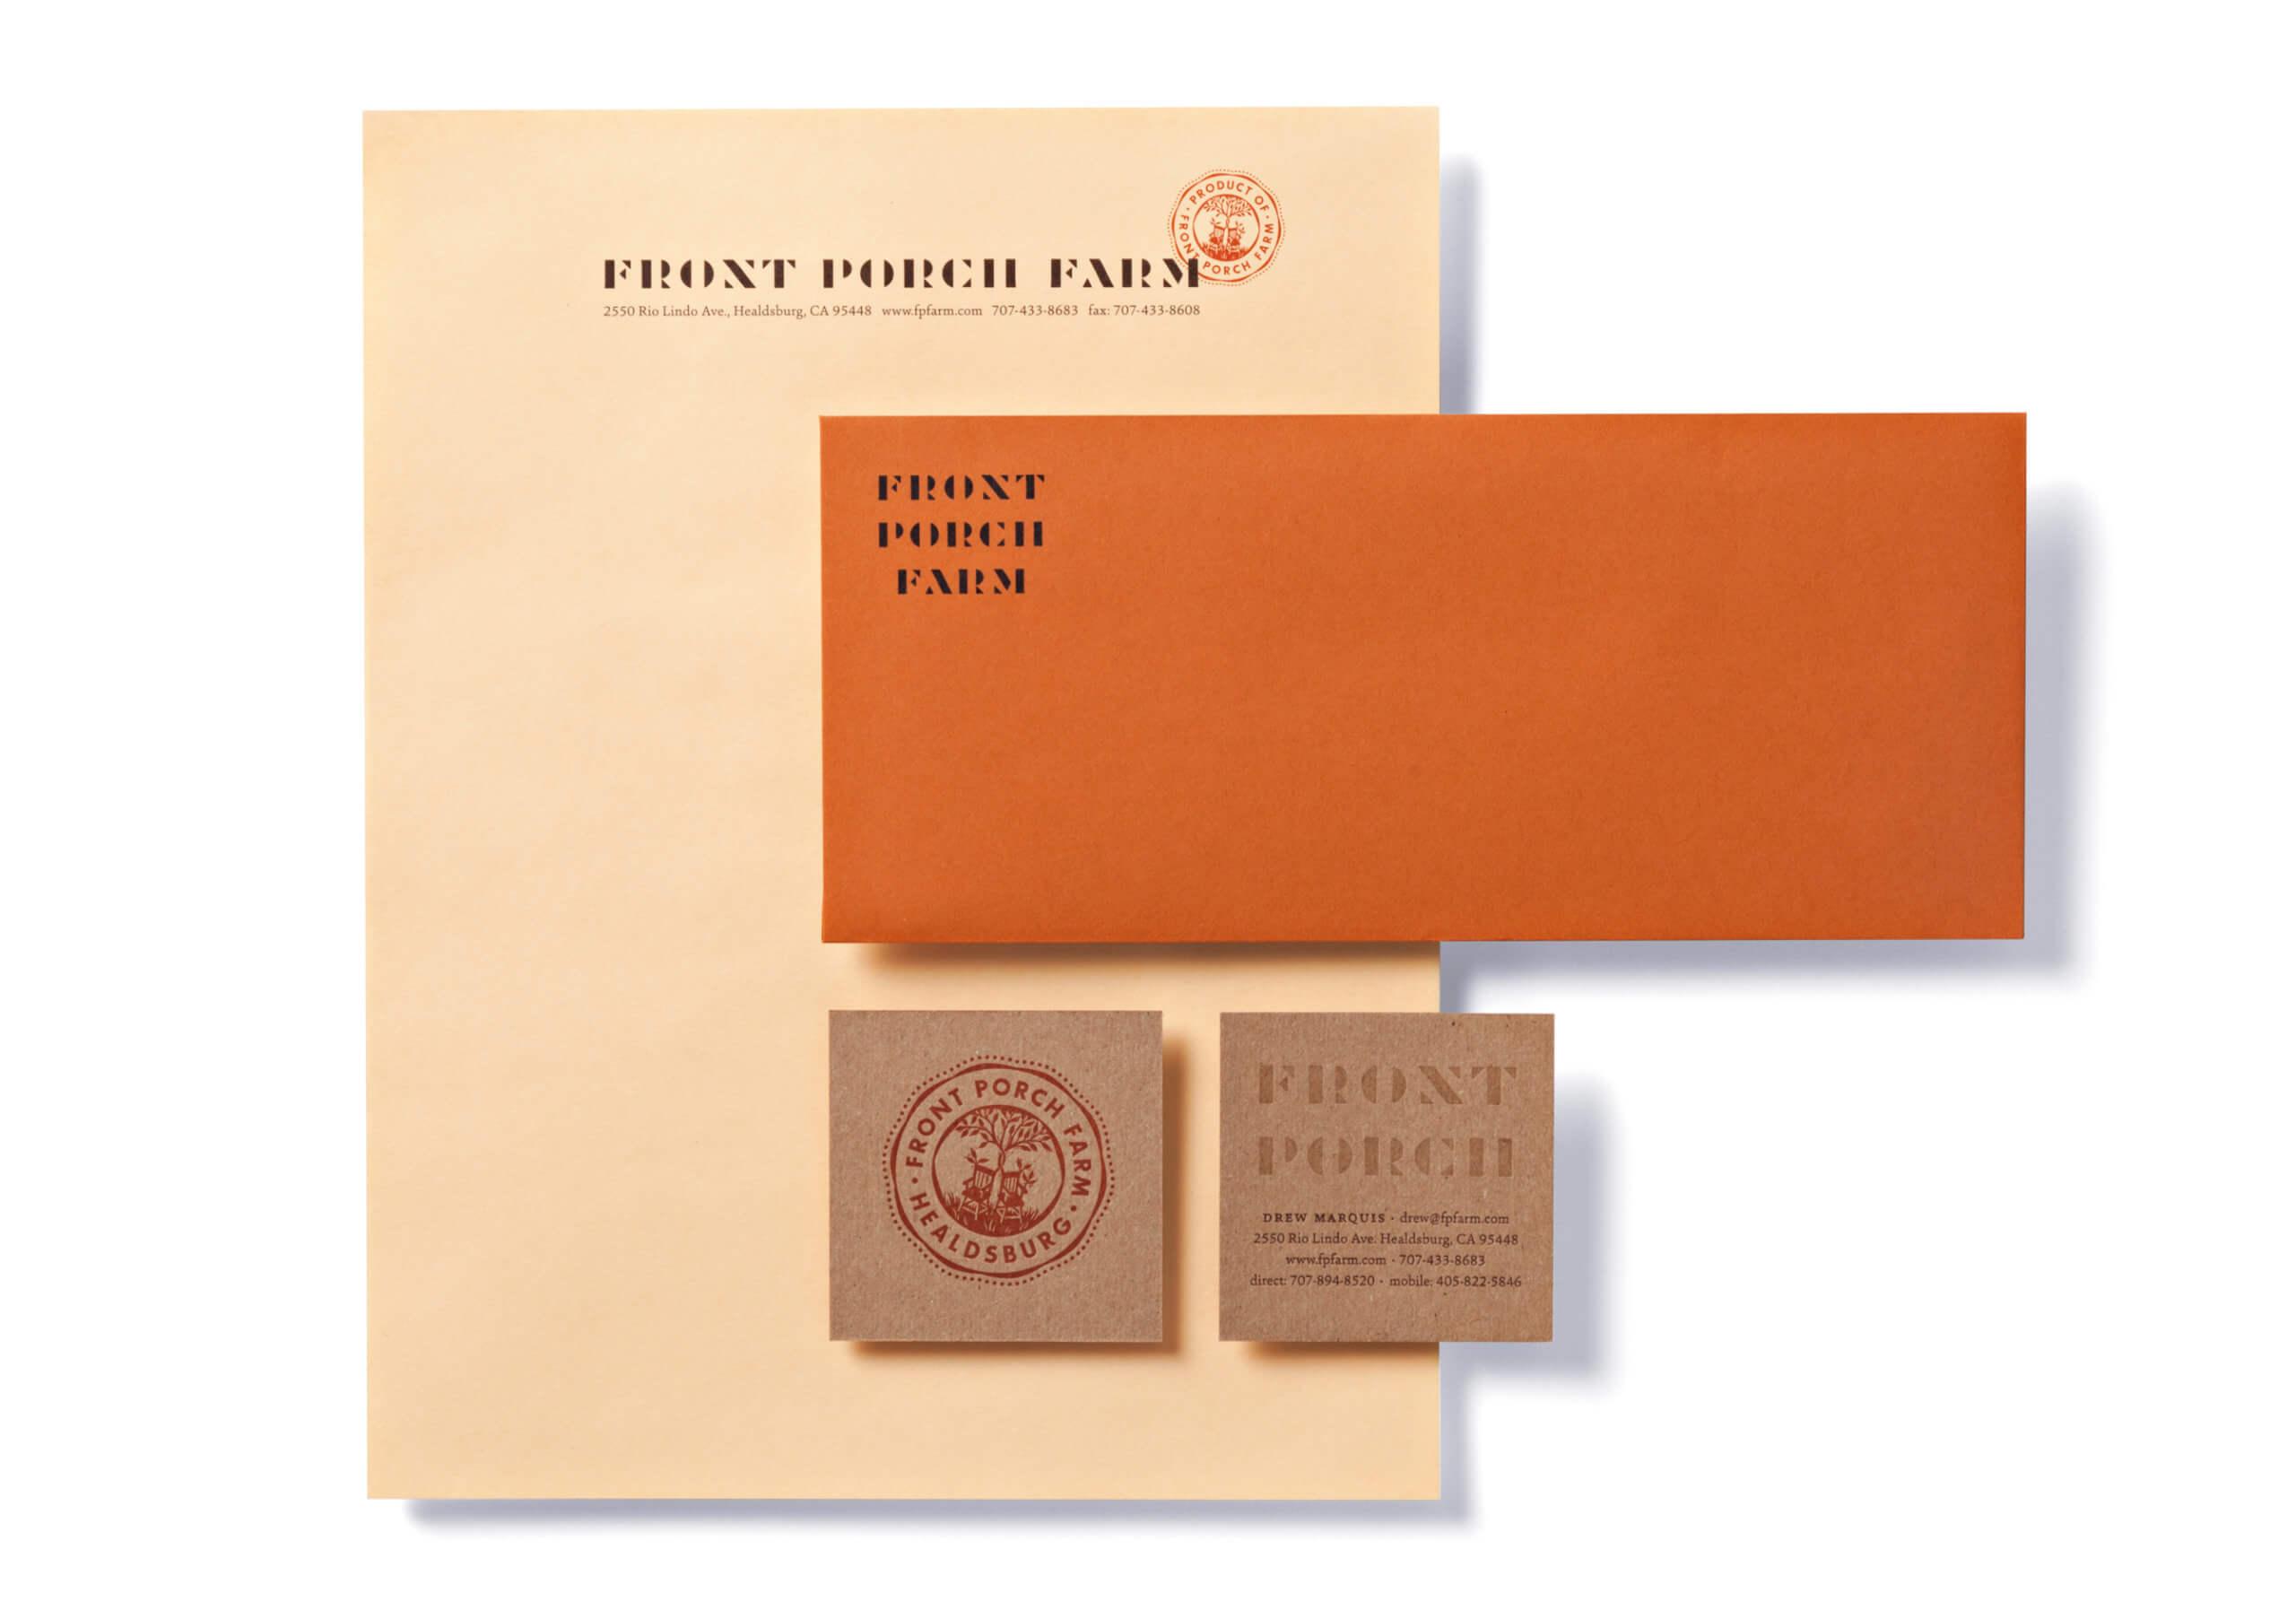 Front Porch Farm peach-colored letterhead, orange envelope, brown kraft square business cards